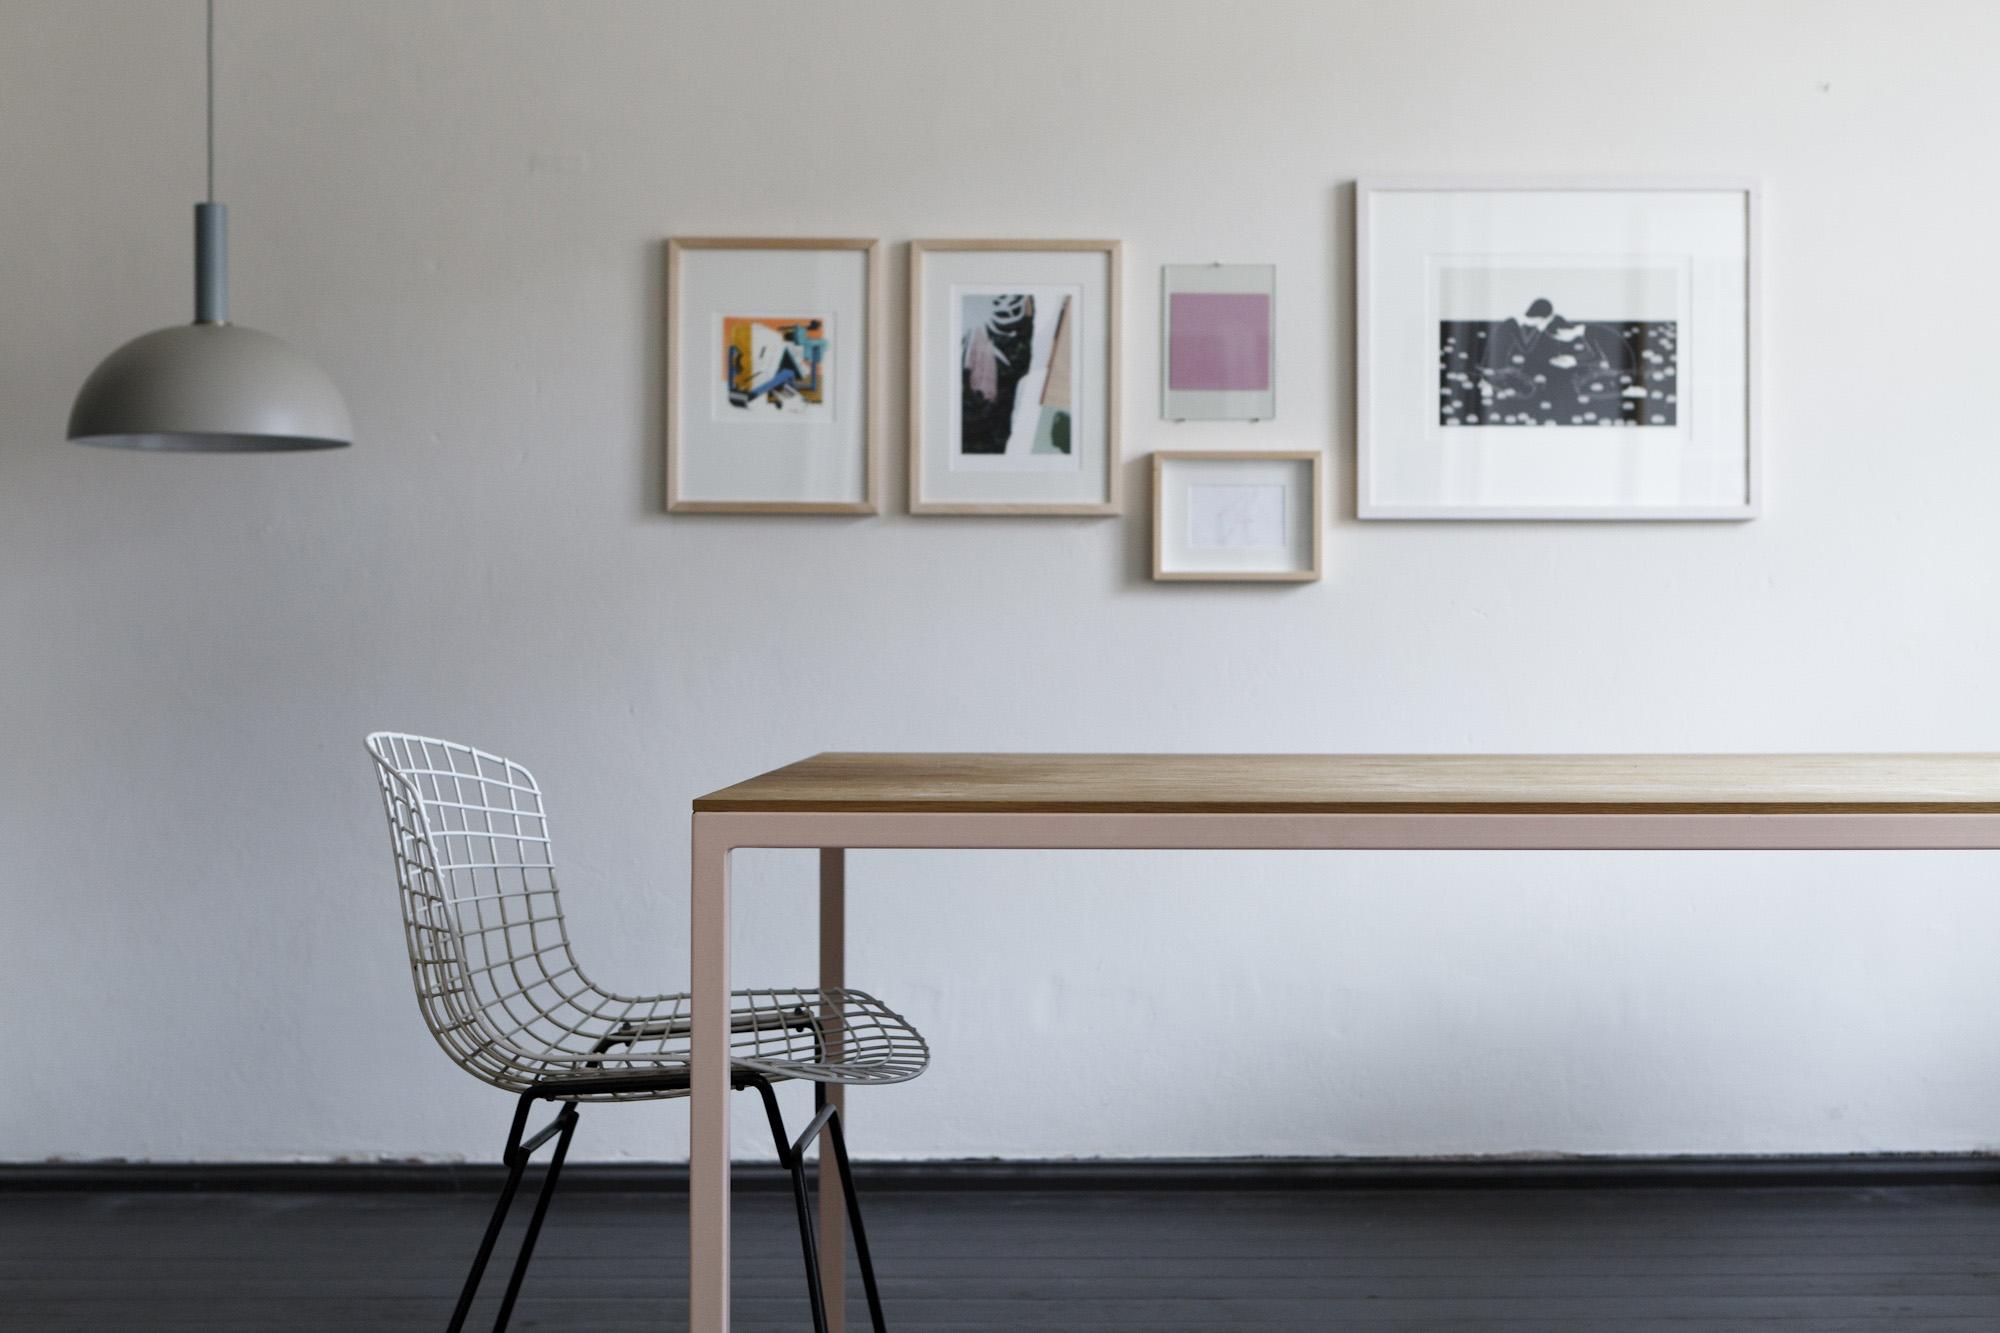 table-tib-so-hme-6246.jpg